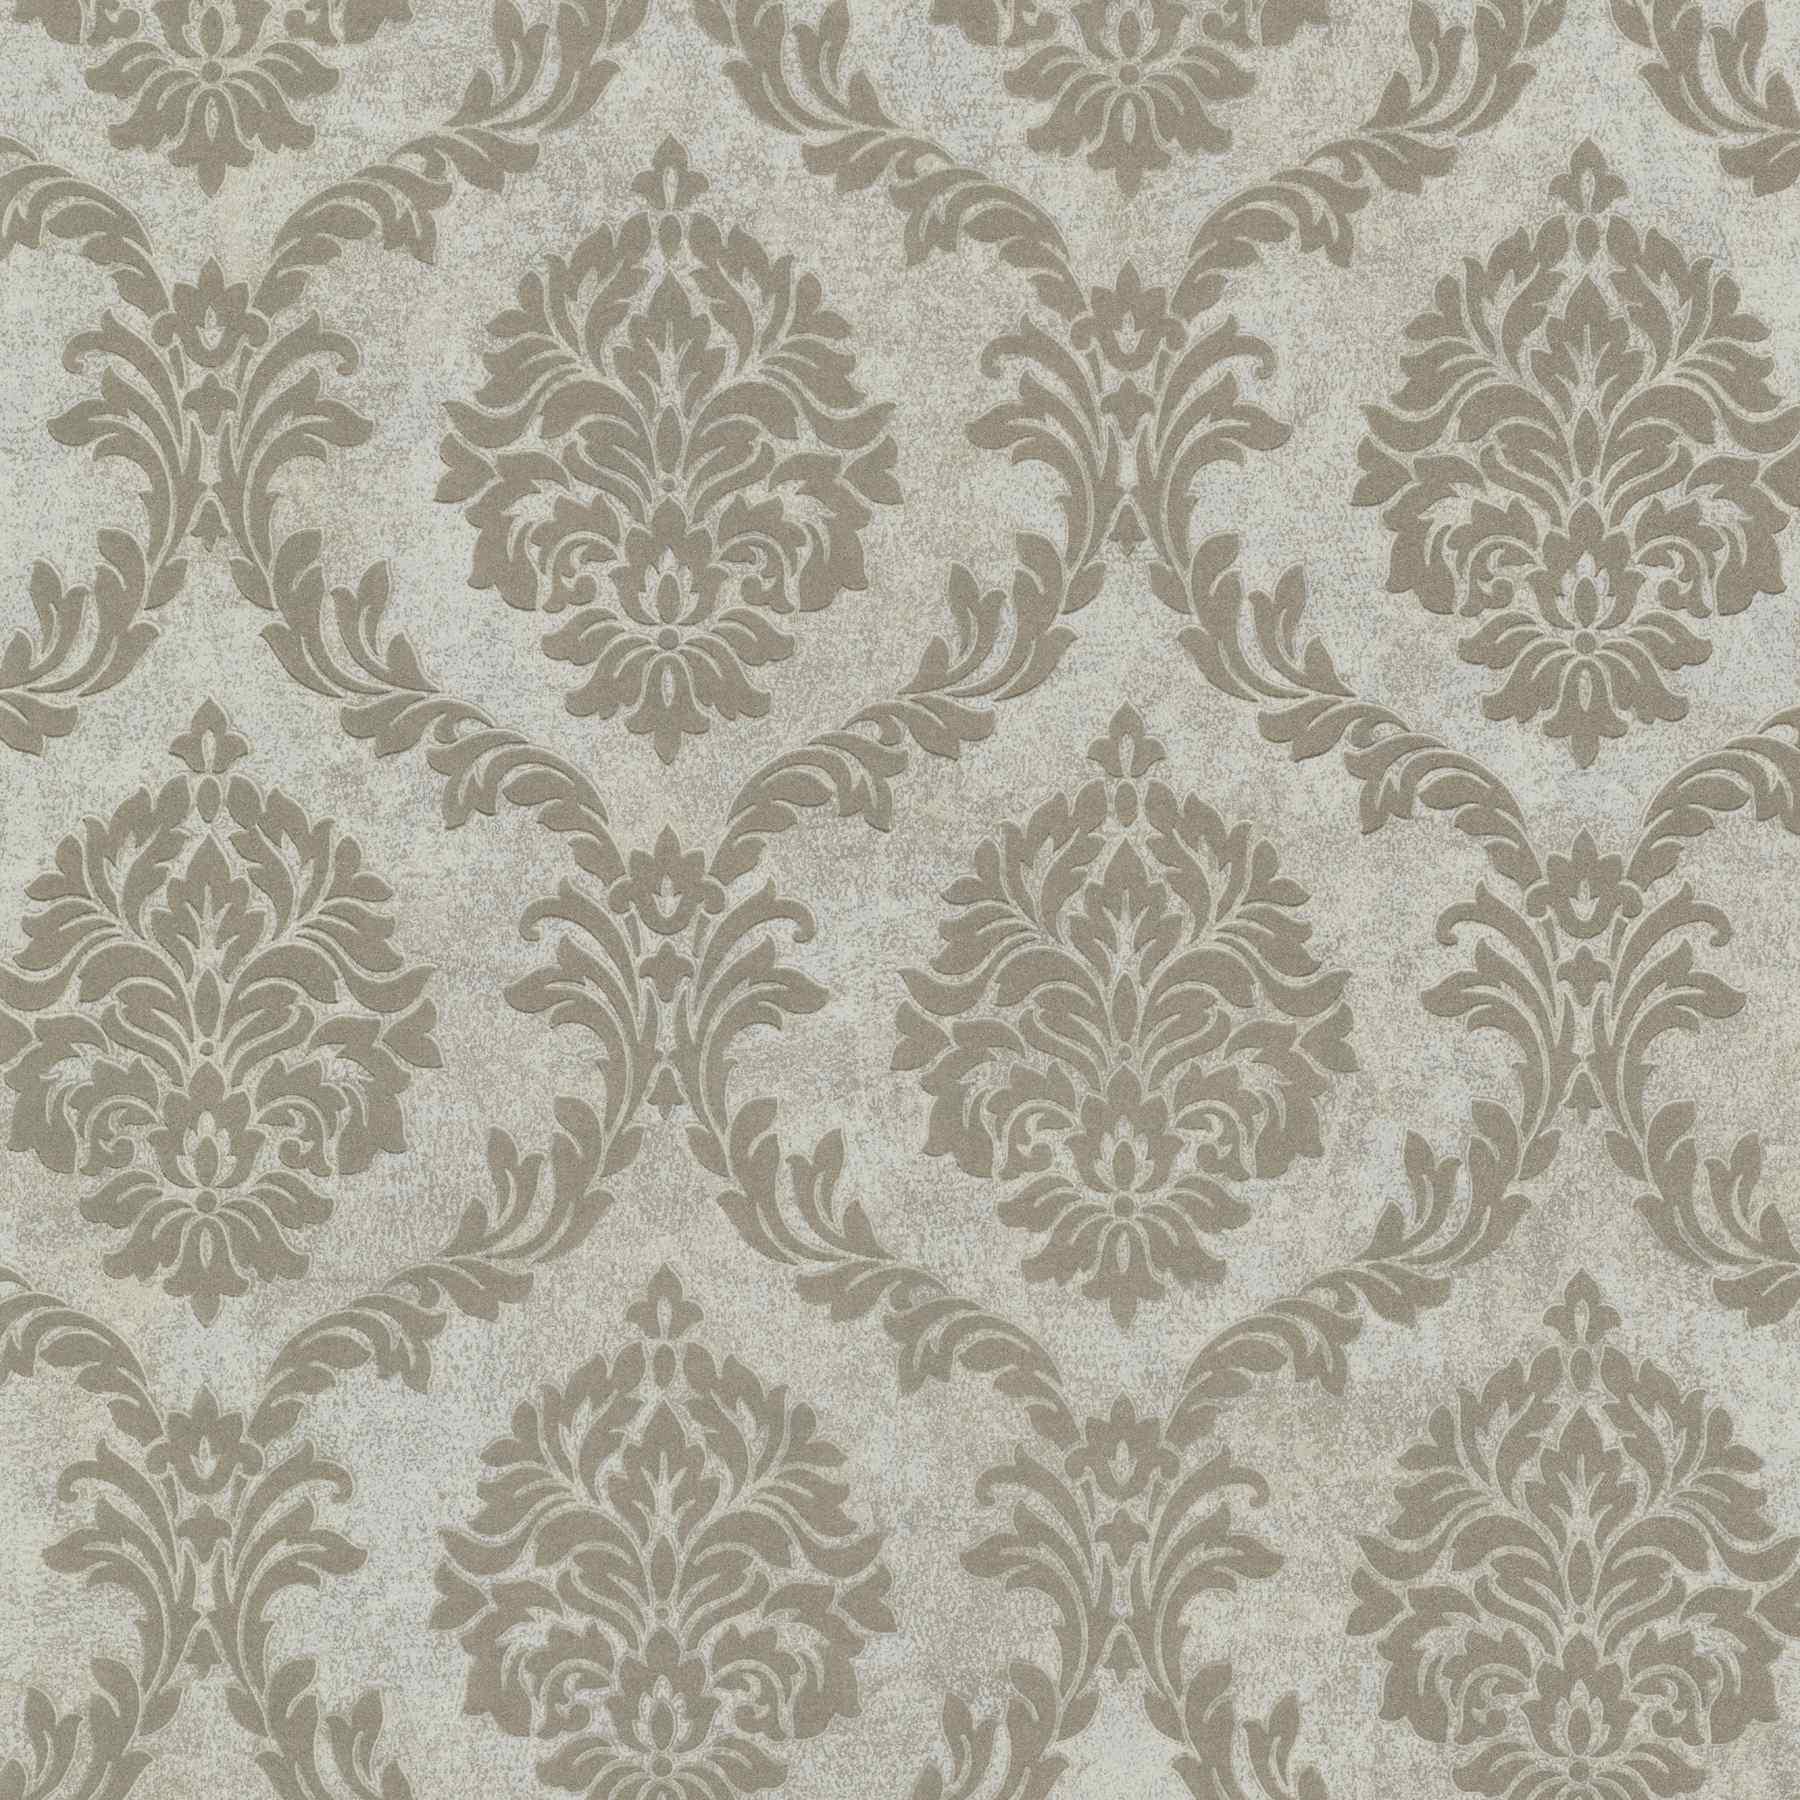 Barock Tapete Auf Leinwand : Vliestapeten Rasch Textil Buckingham Tapete 069059 Barock grau beige